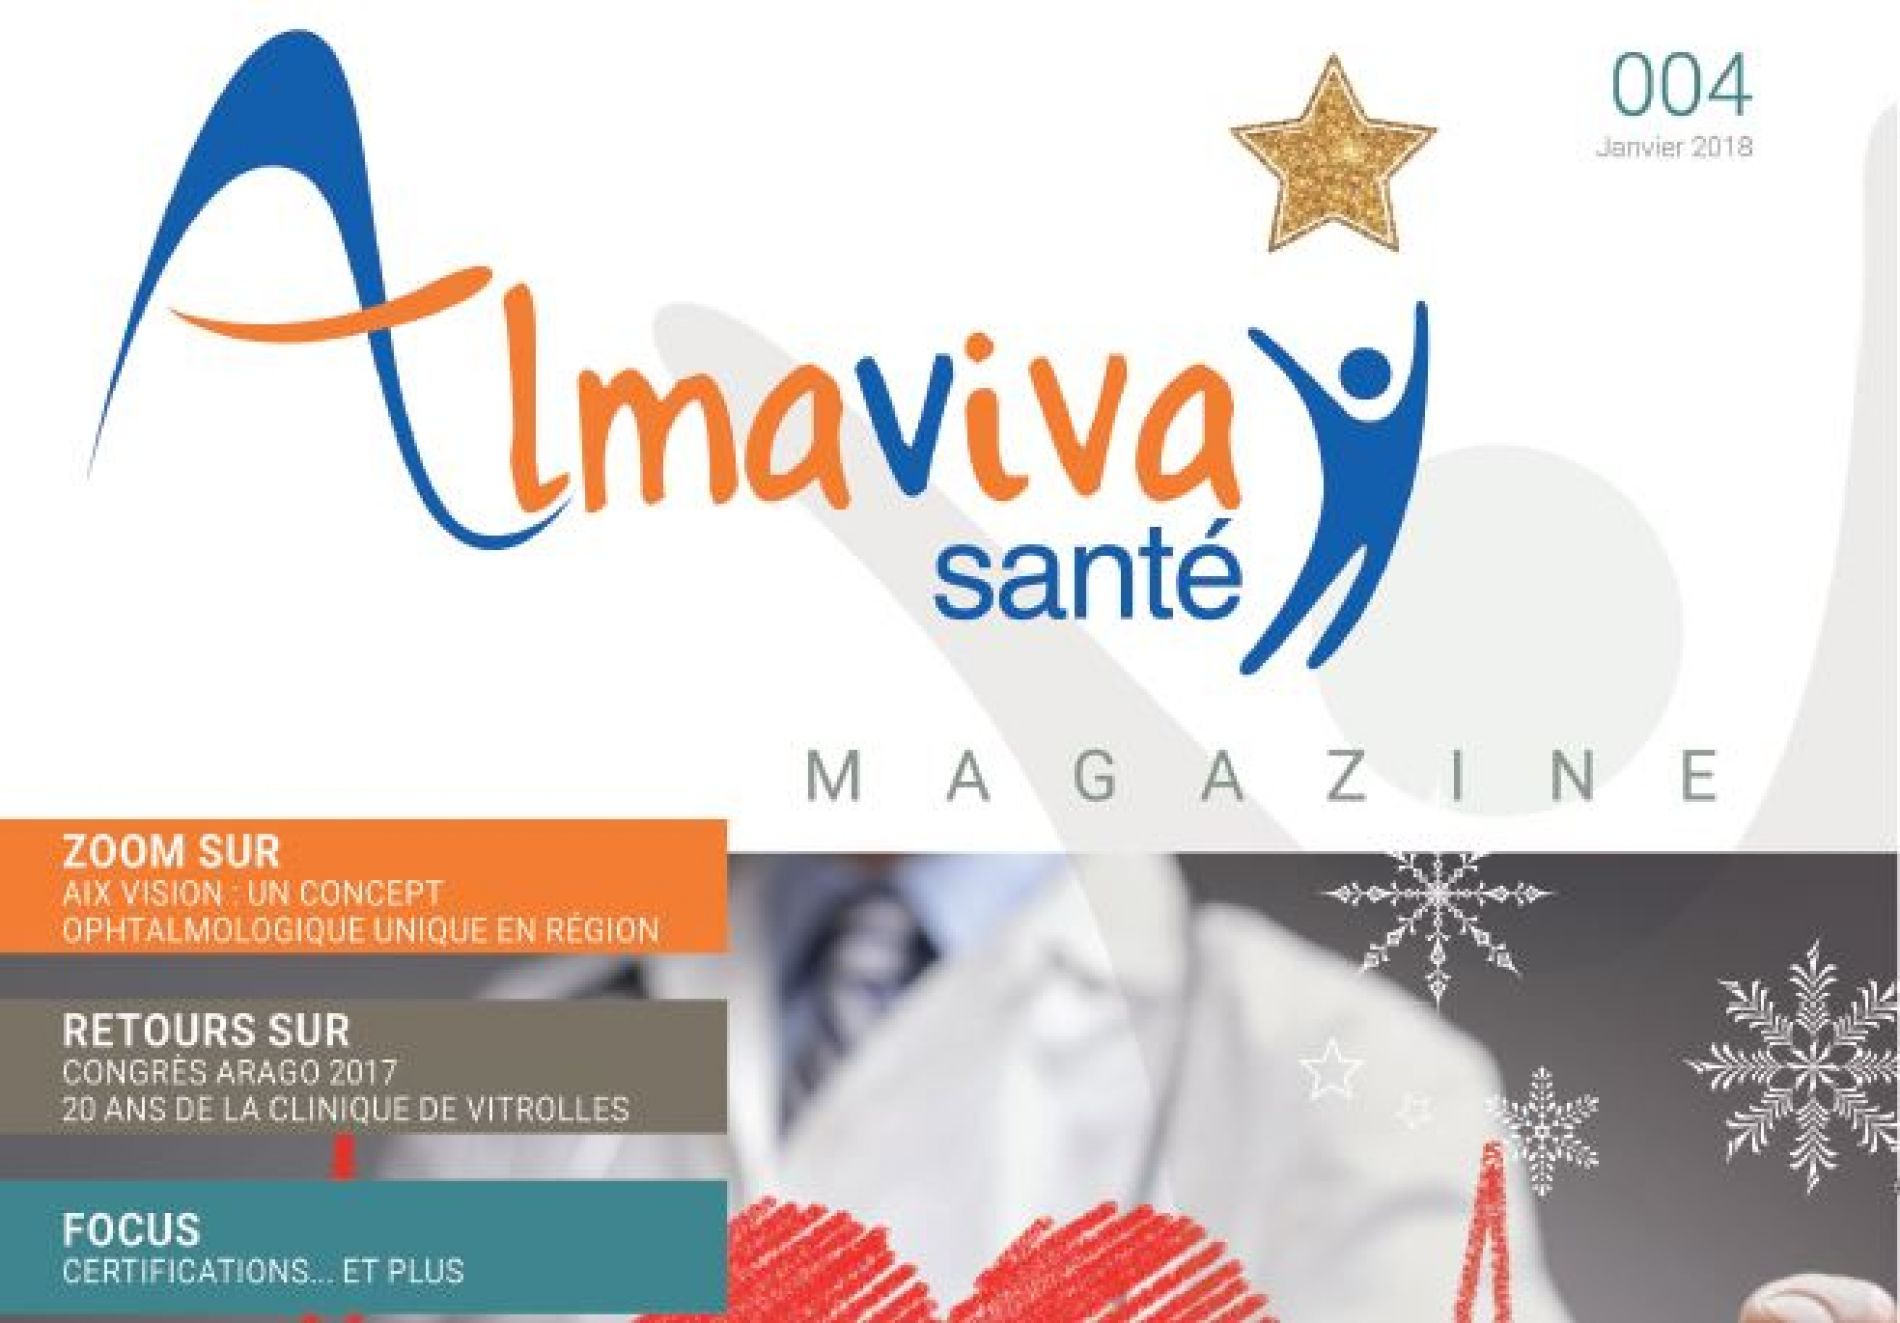 Magazine Almaviva Santé N°4